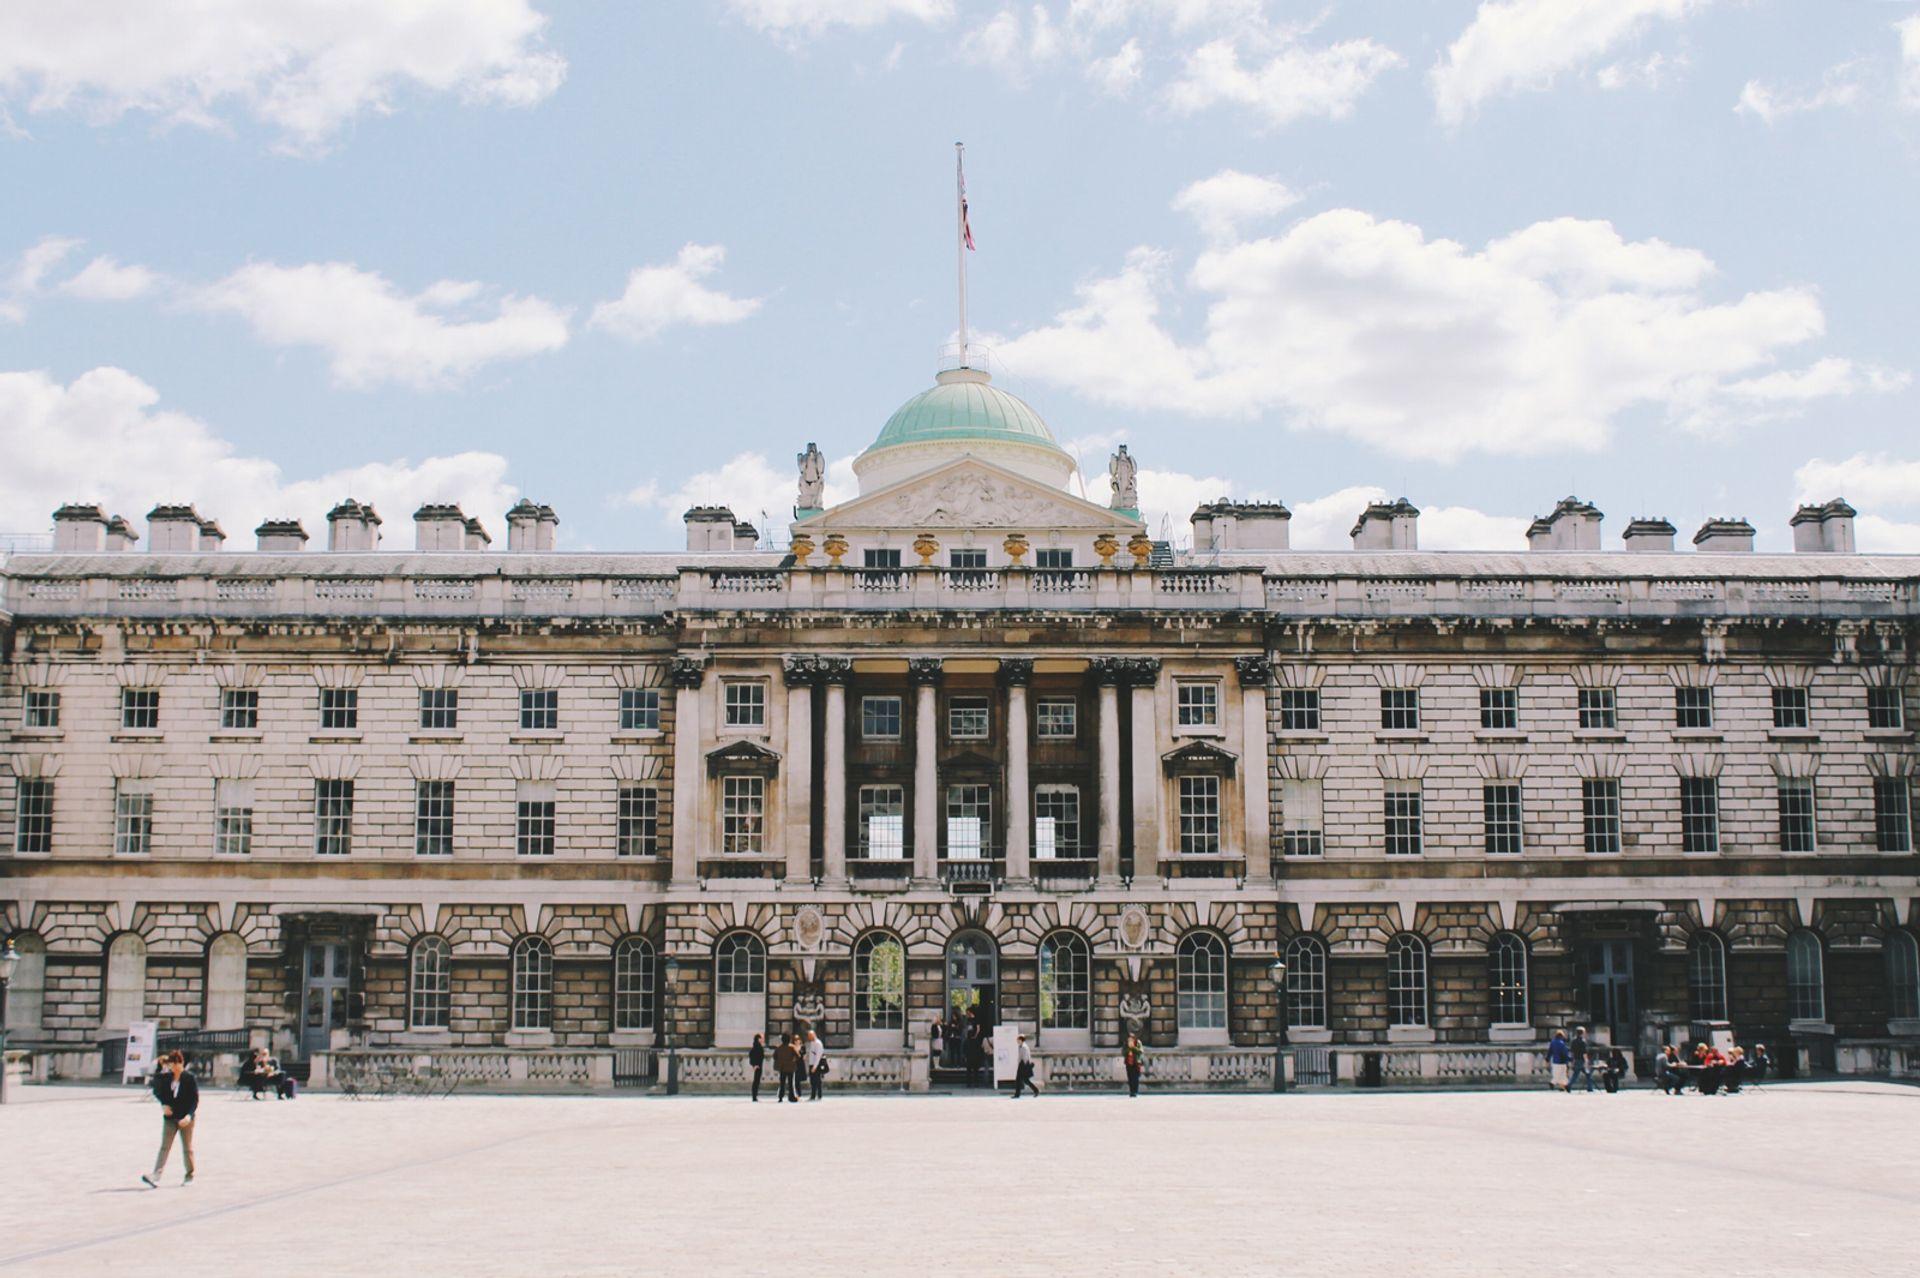 Somerset House, London © Robert Bye